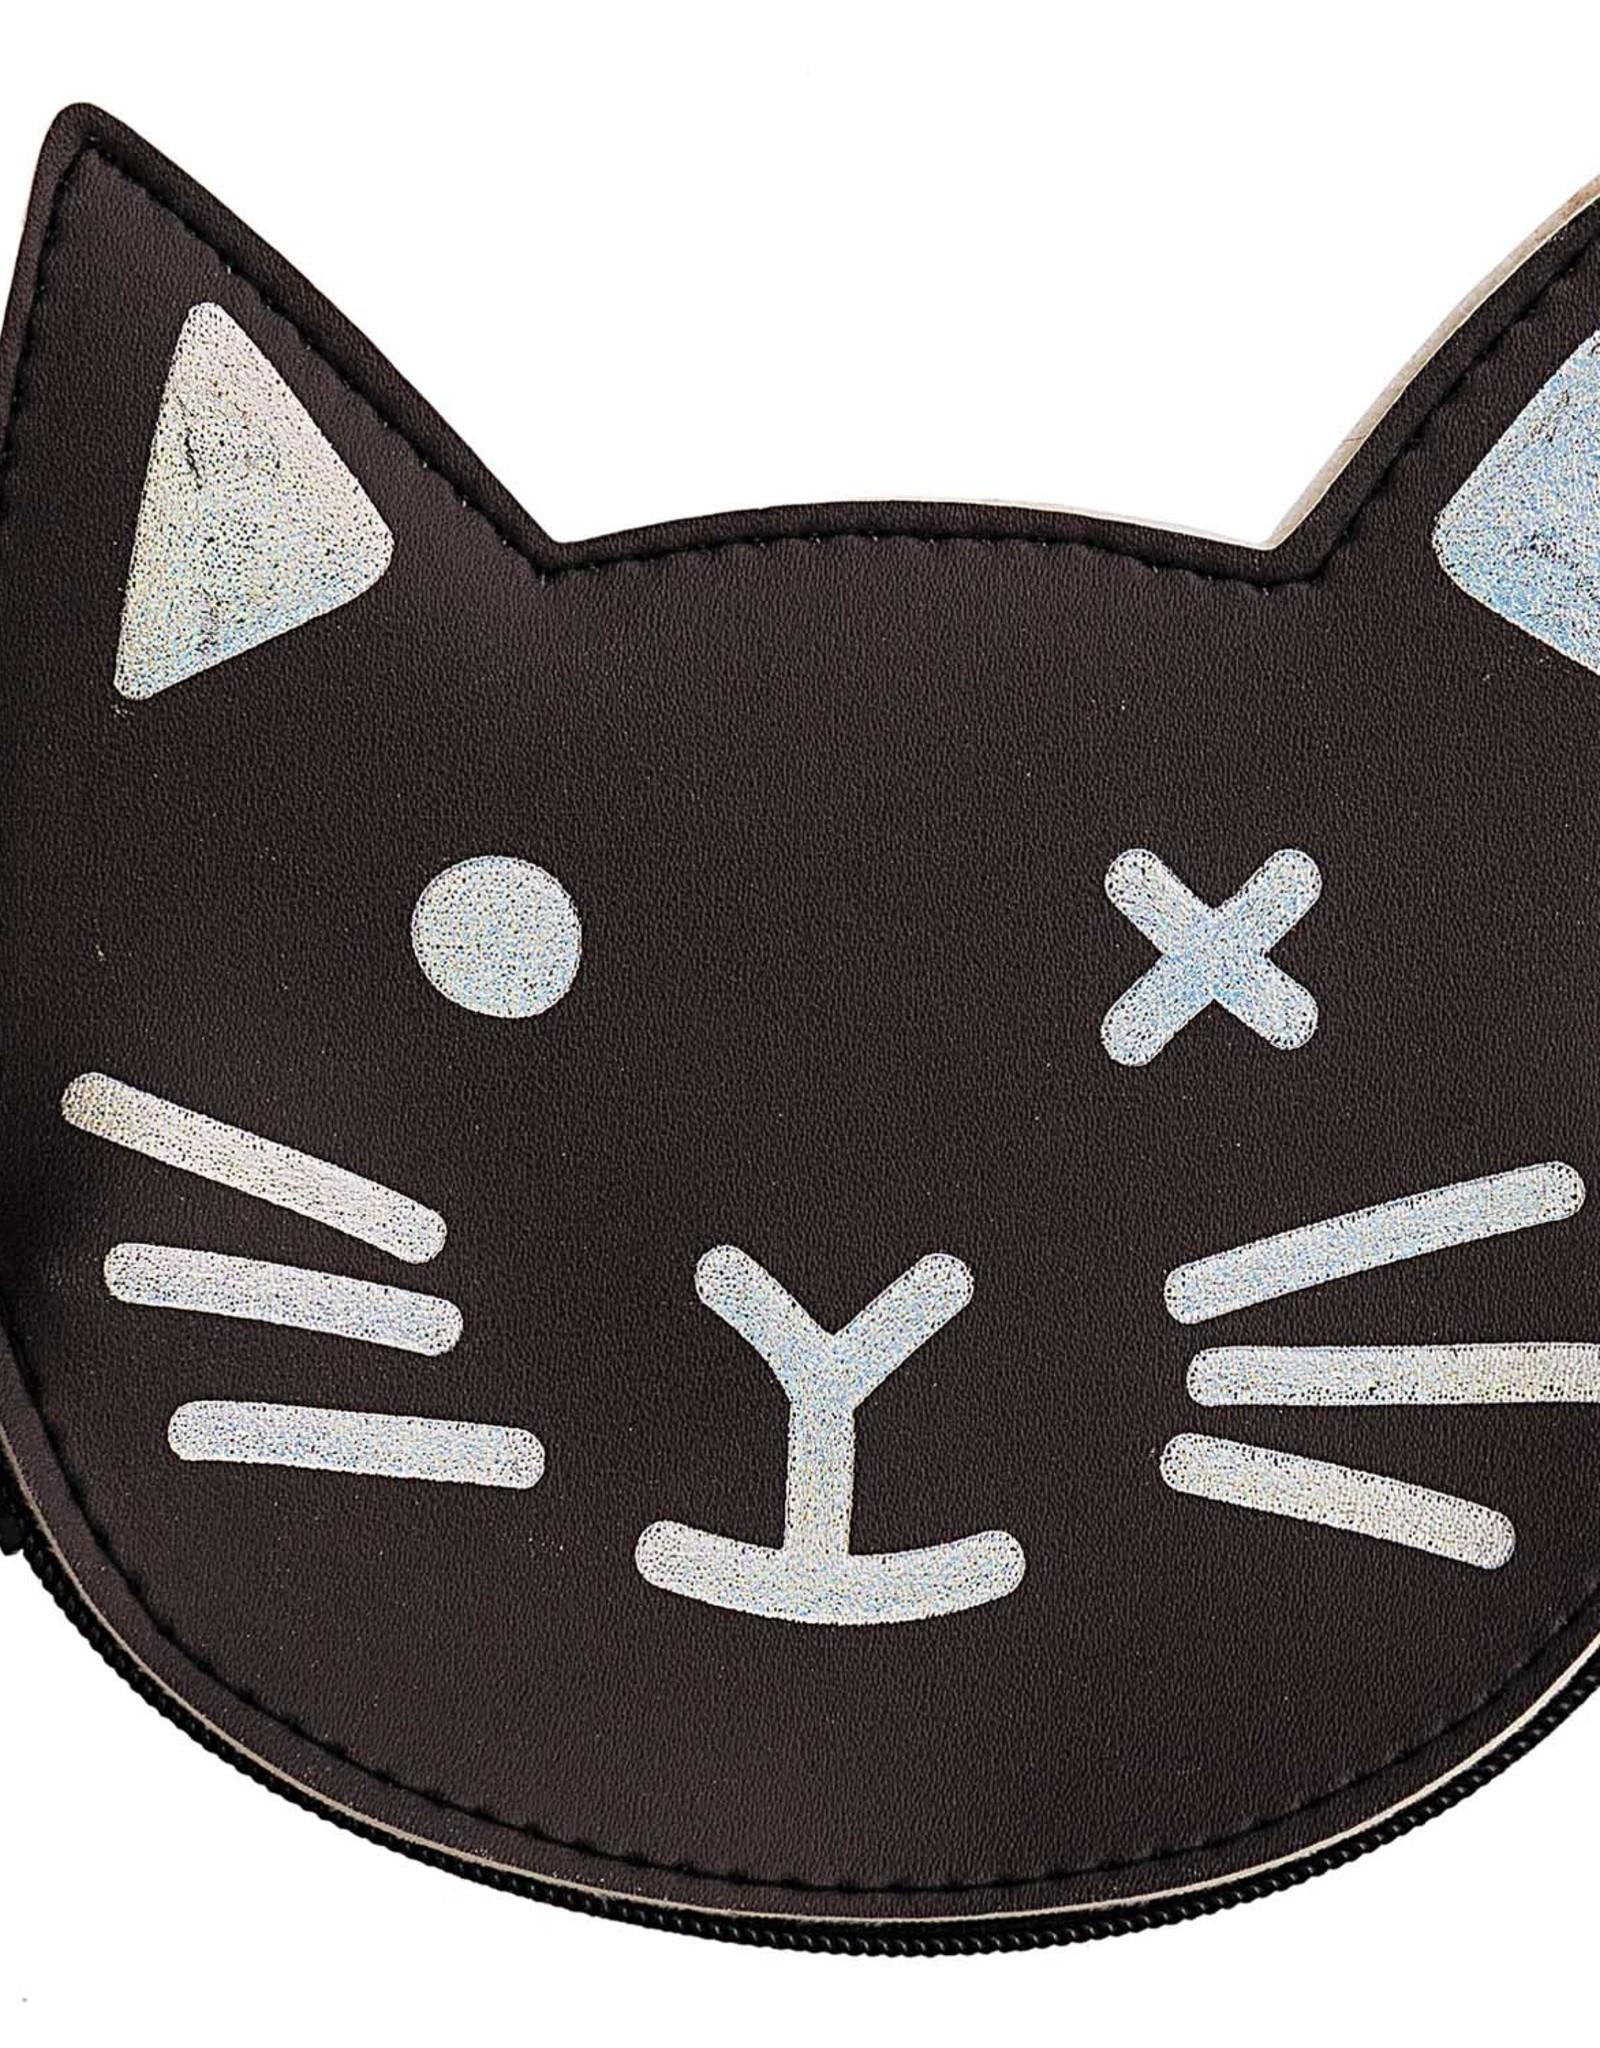 rico design rico design: ritstasje kat zwart